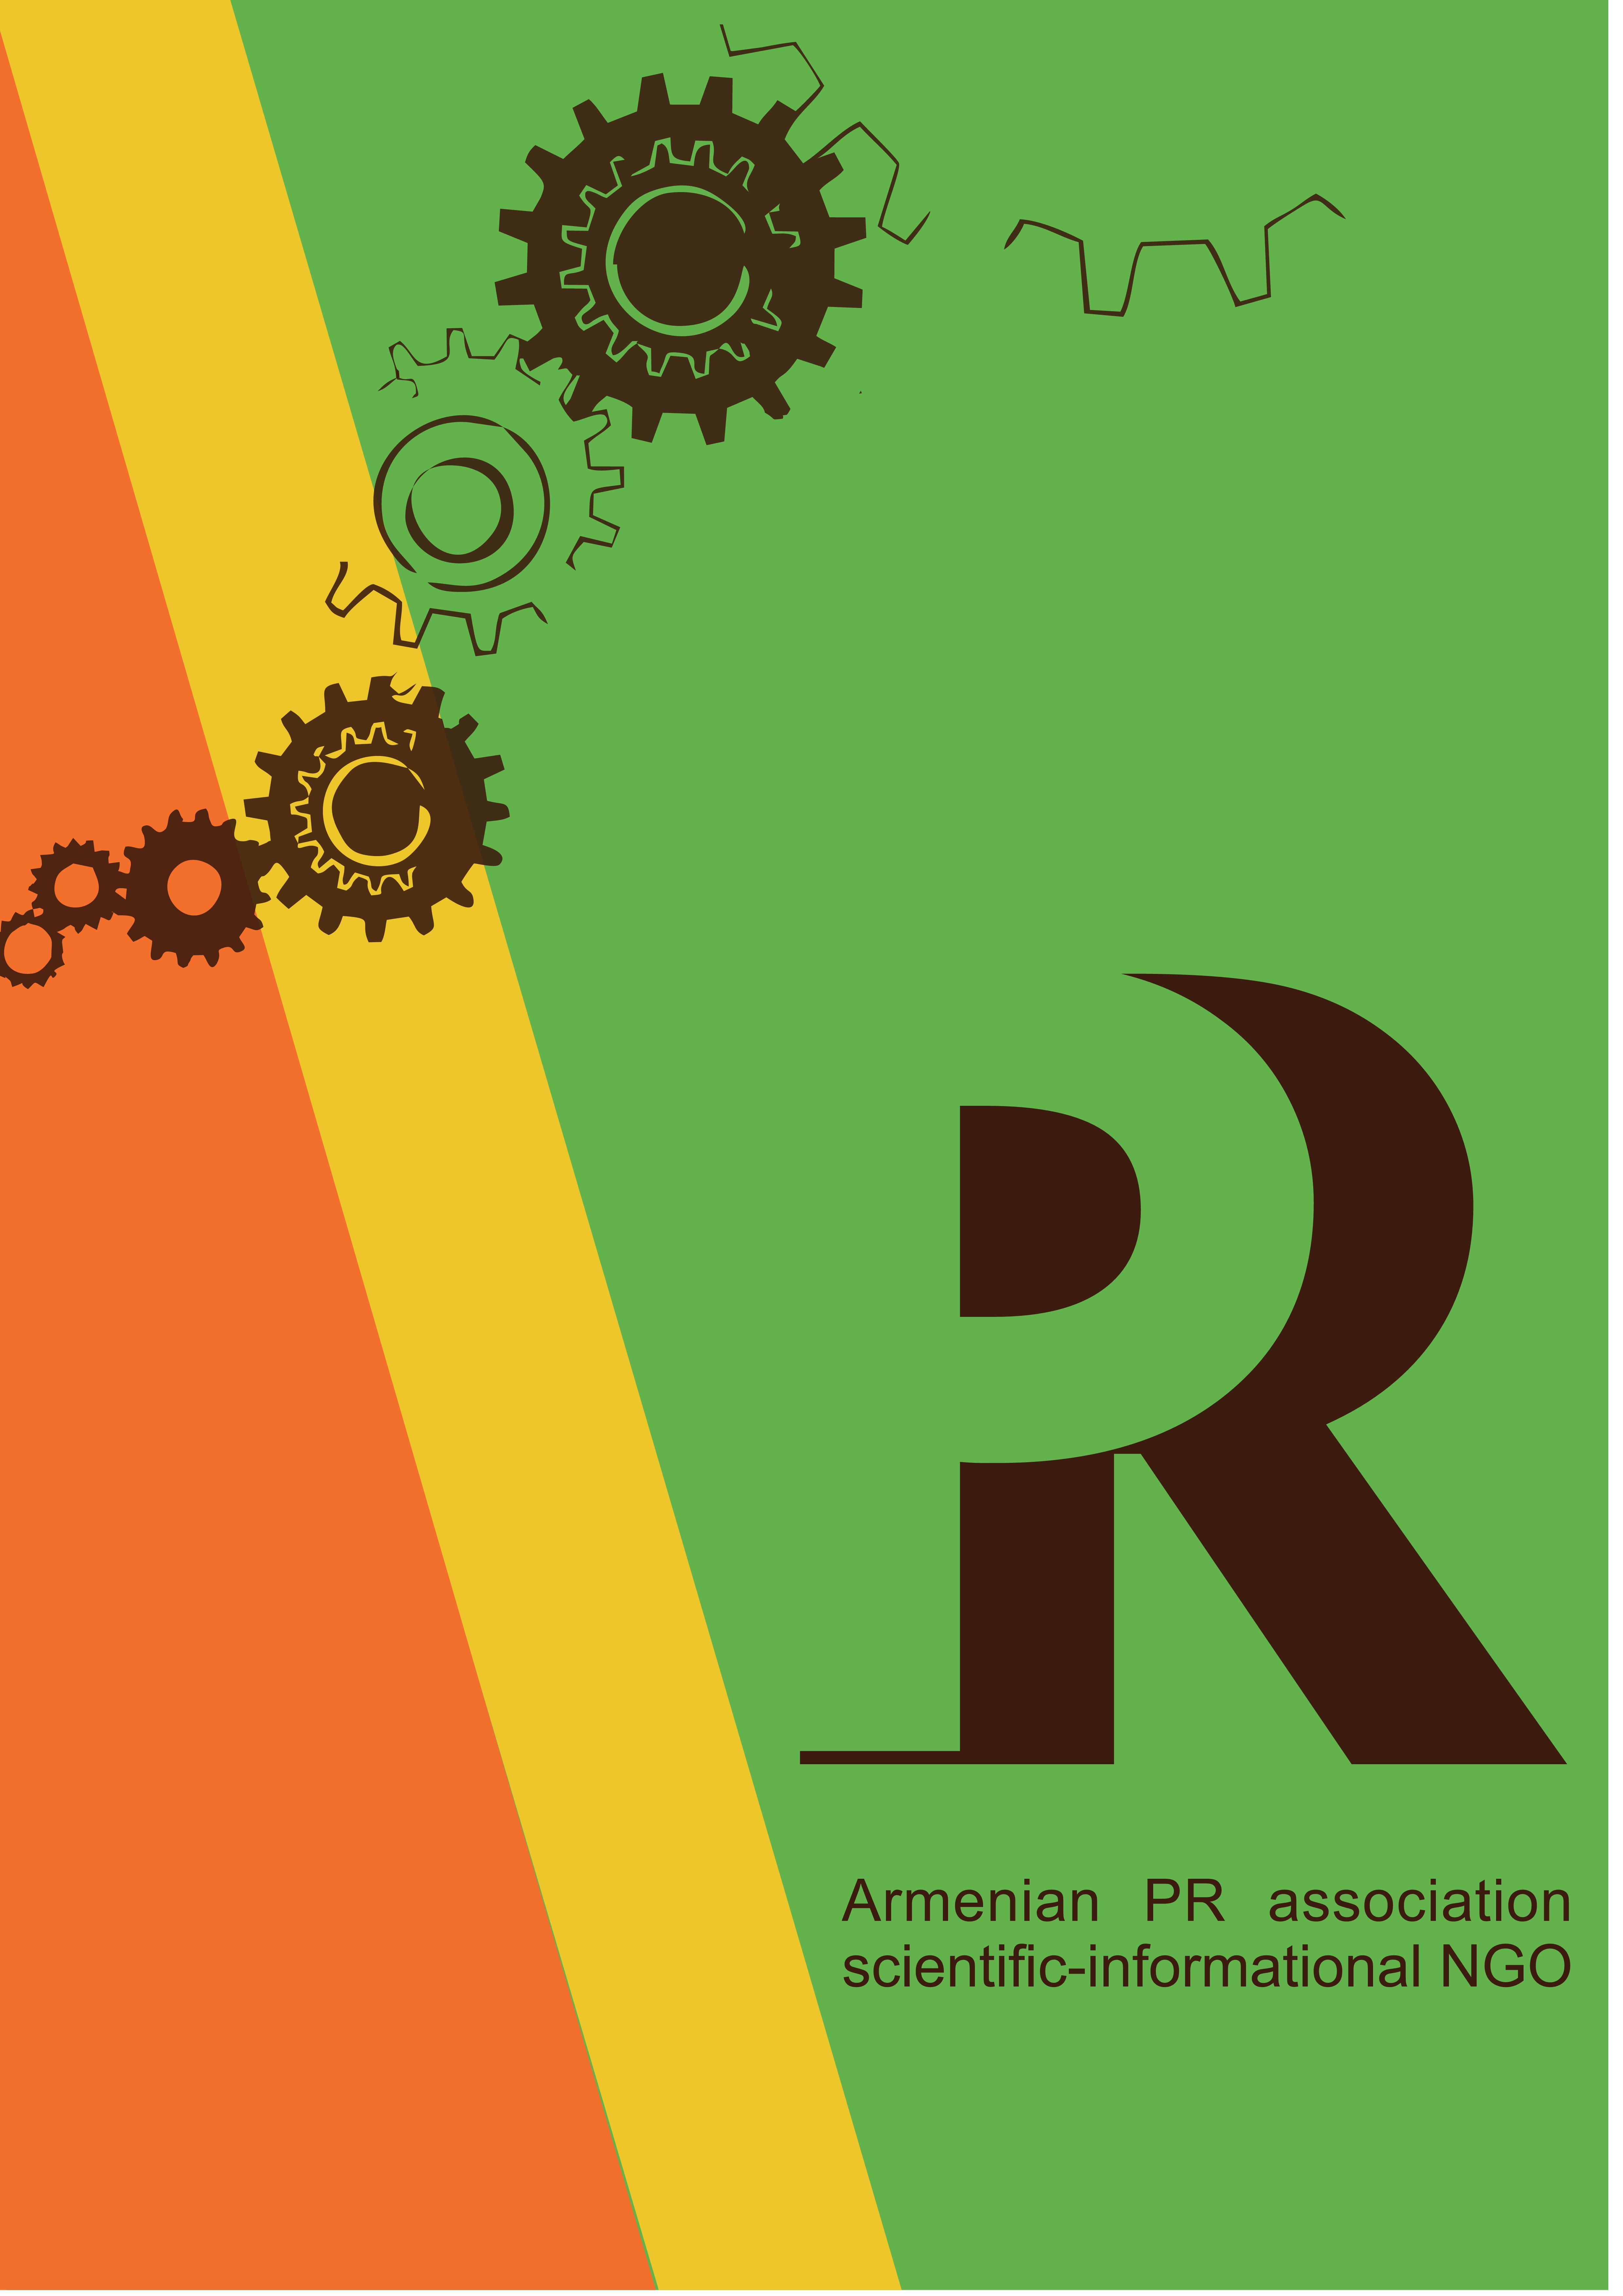 Armenian PR association